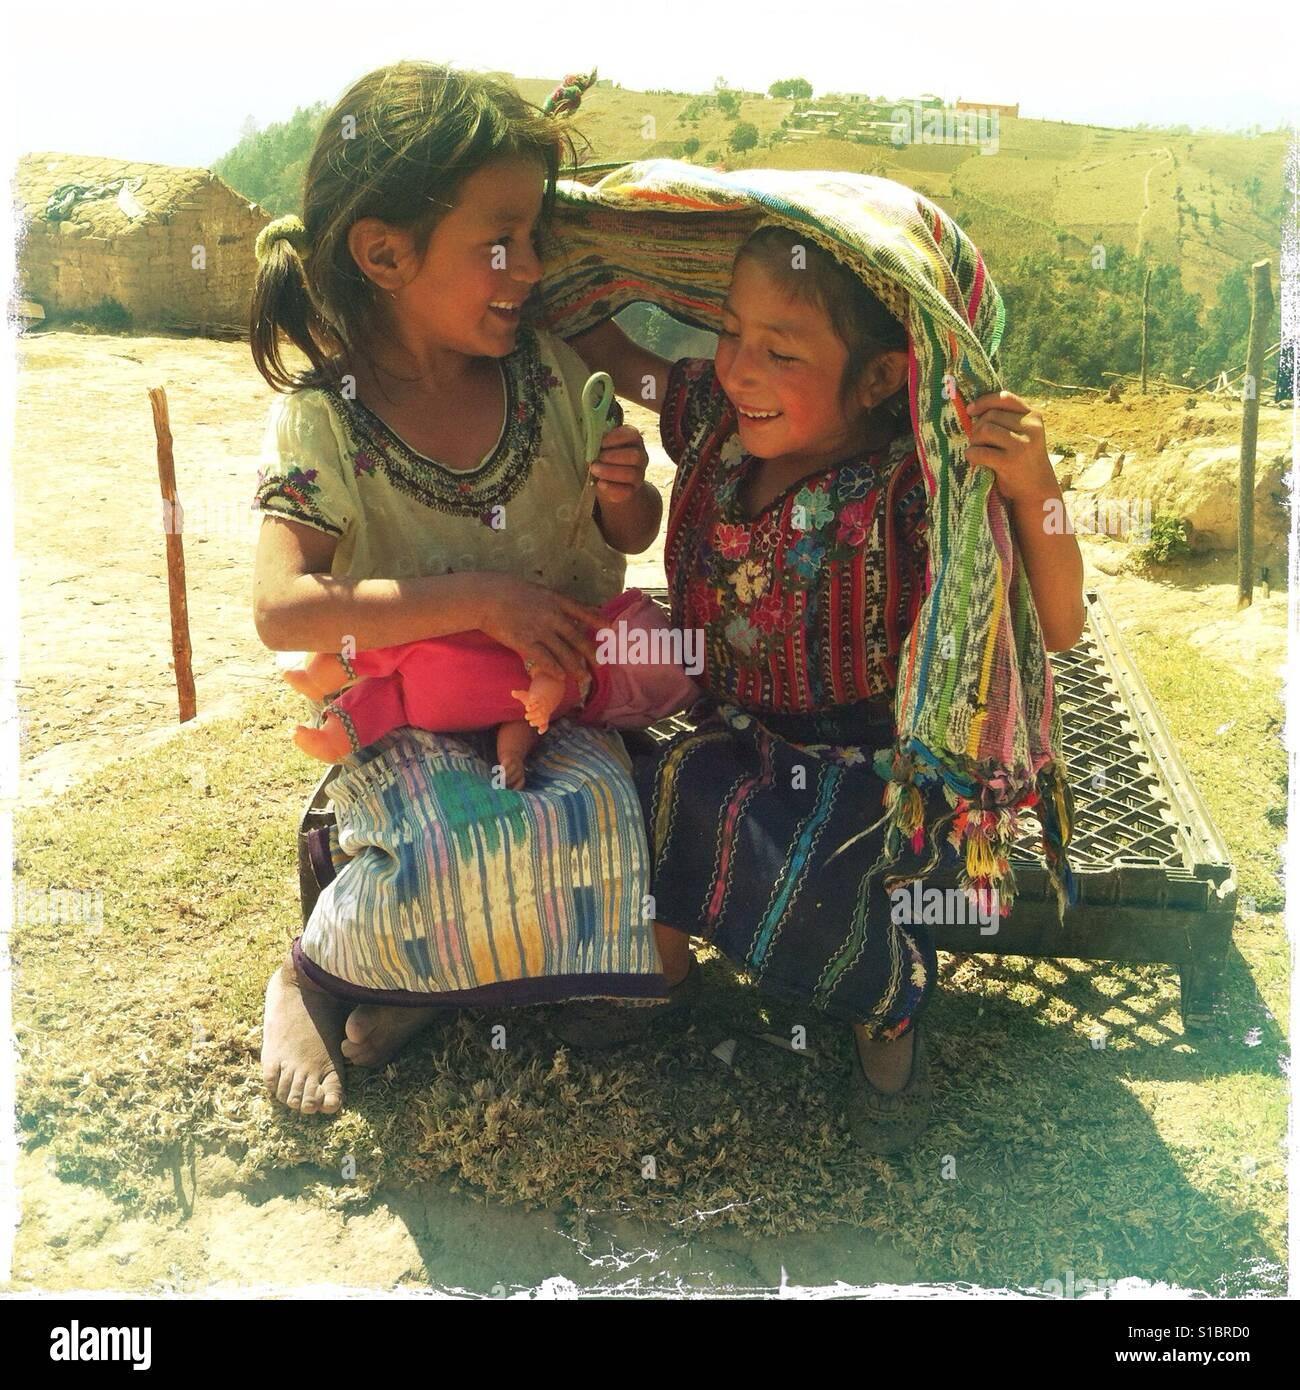 Maya indigenous girls play in Caserio Panuca, Solola, Guatemala. - Stock Image